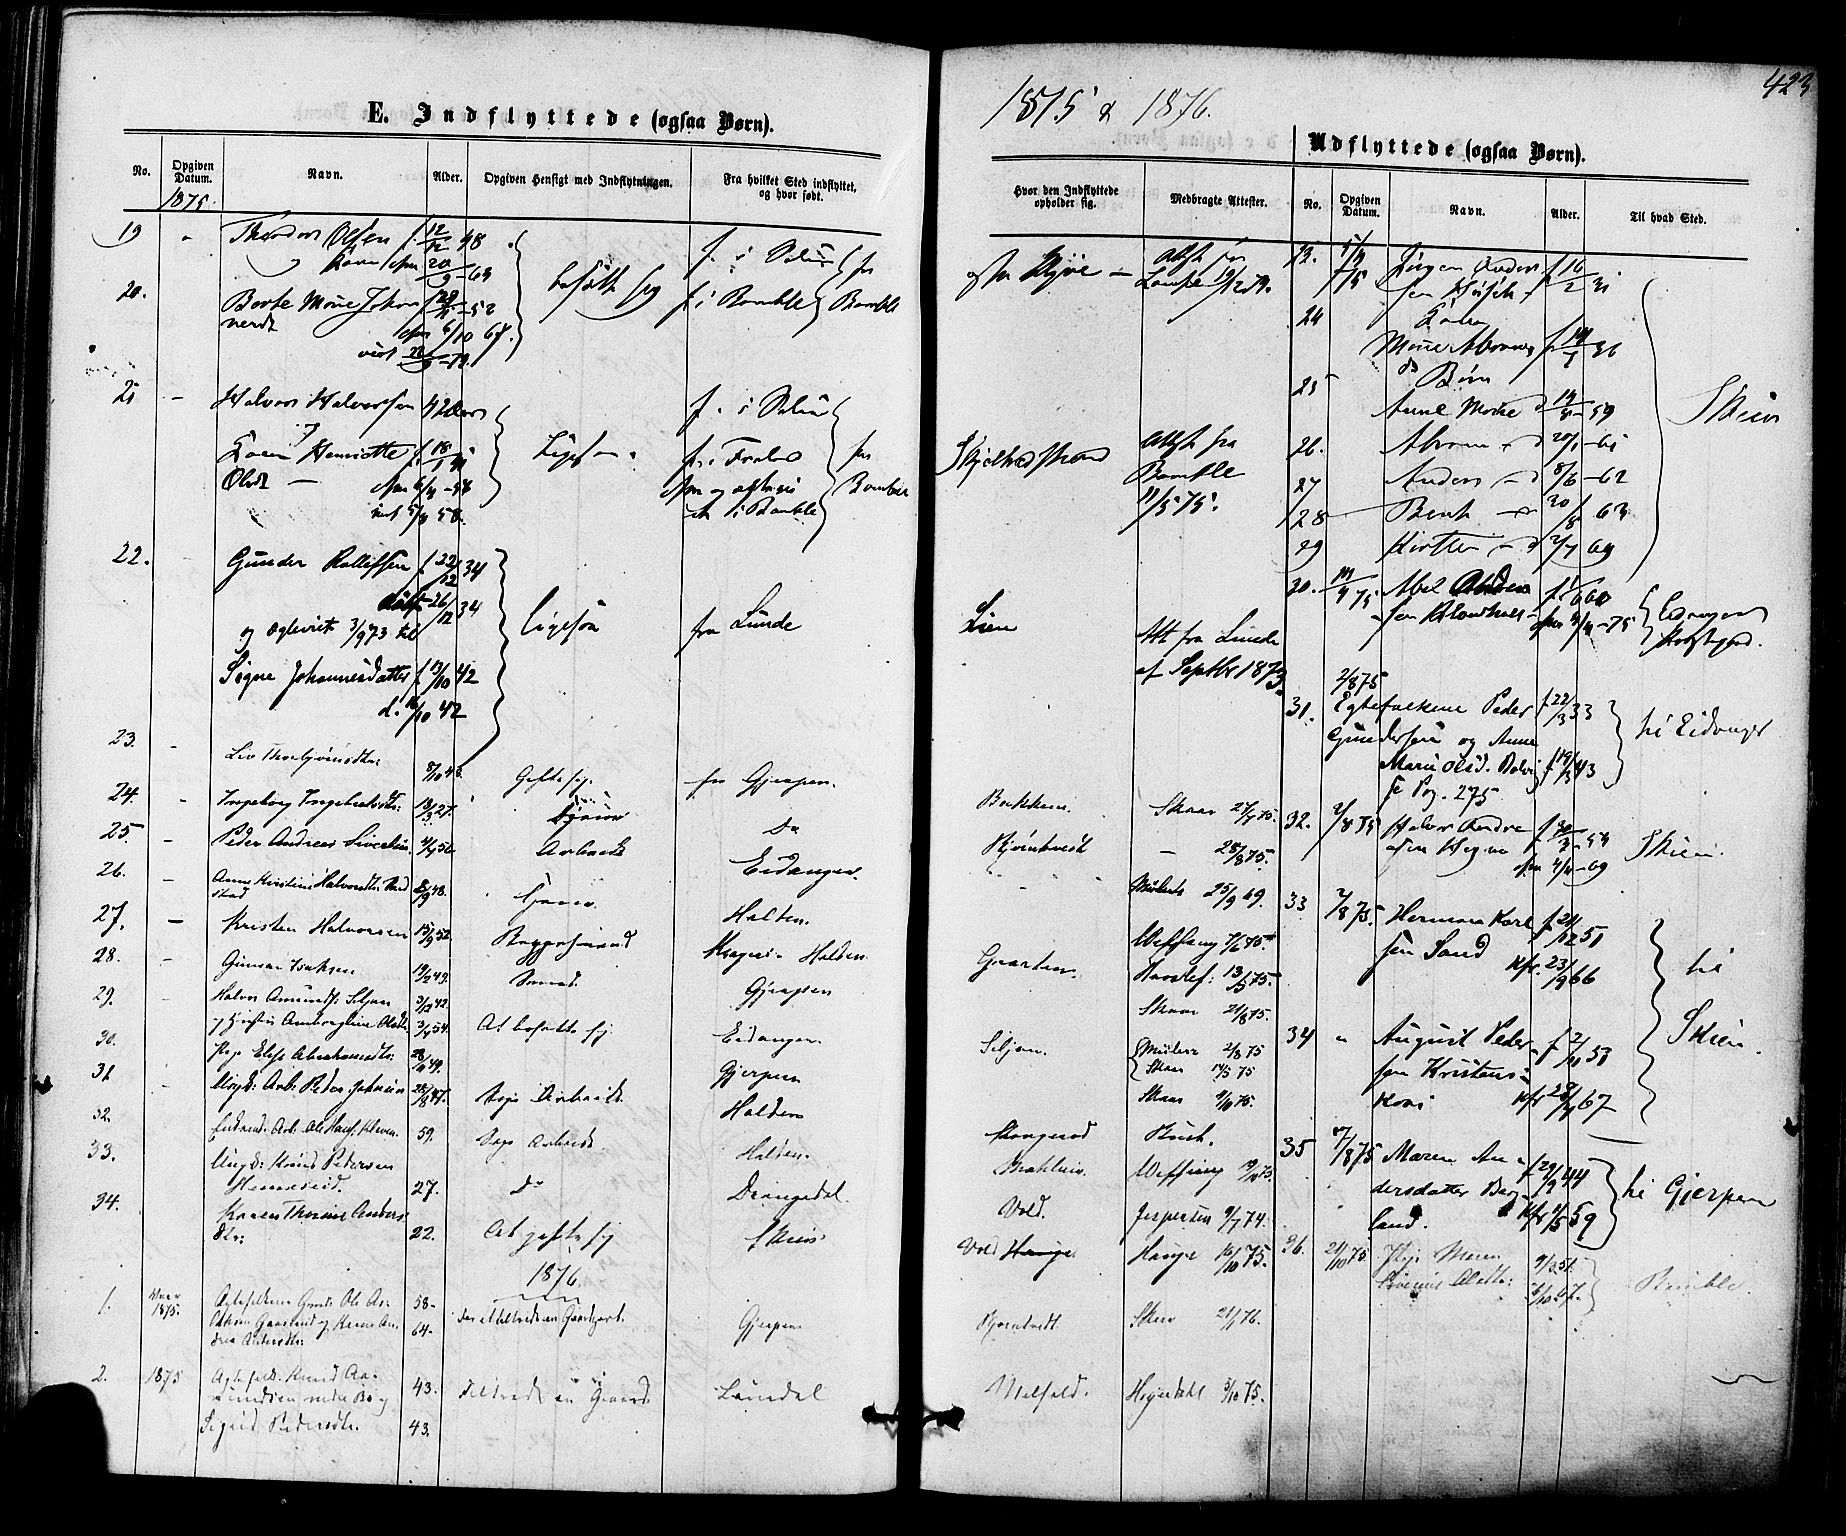 SAKO, Solum kirkebøker, F/Fa/L0008: Ministerialbok nr. I 8, 1865-1876, s. 423